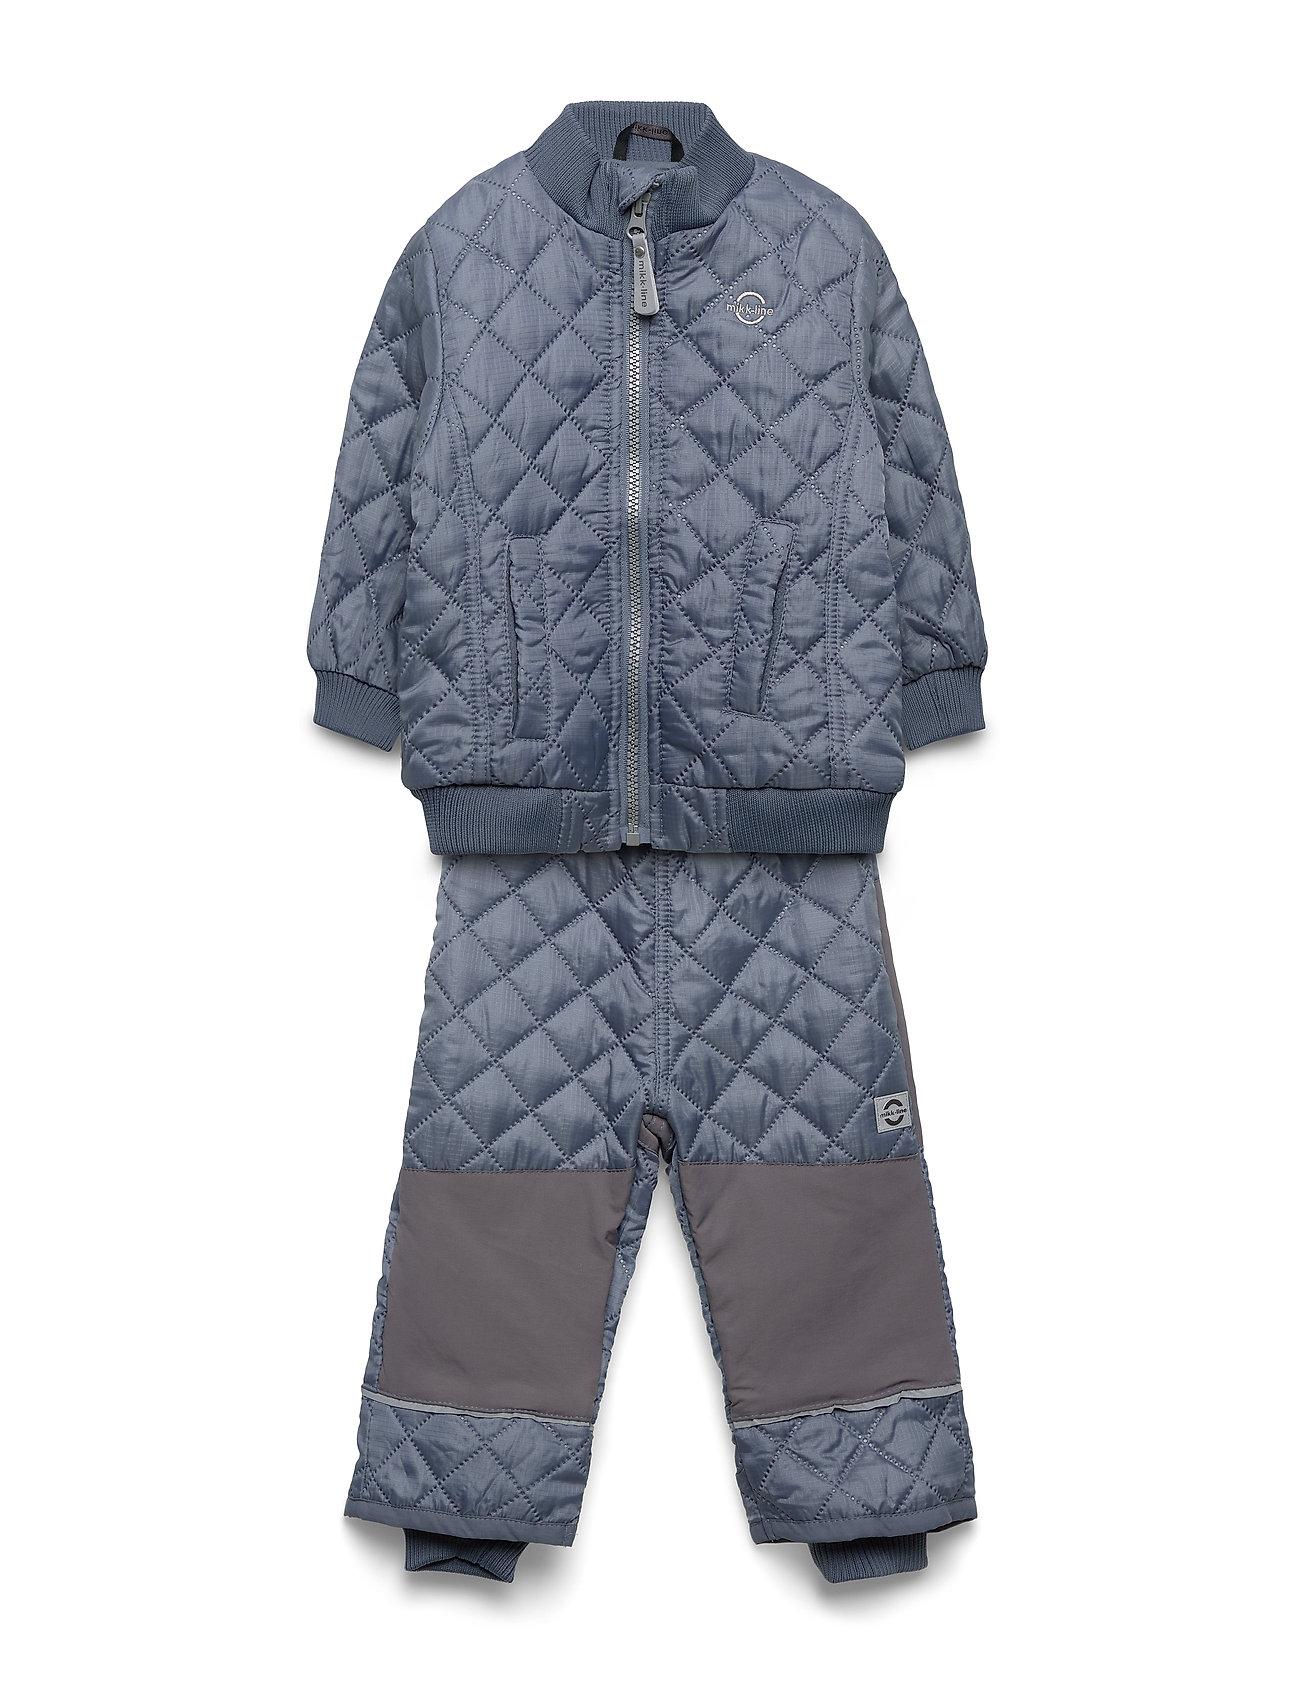 Image of Termo Set W. Fleece In Jacket Outerwear Thermo Outerwear Grå Mikk-Line (3333148775)